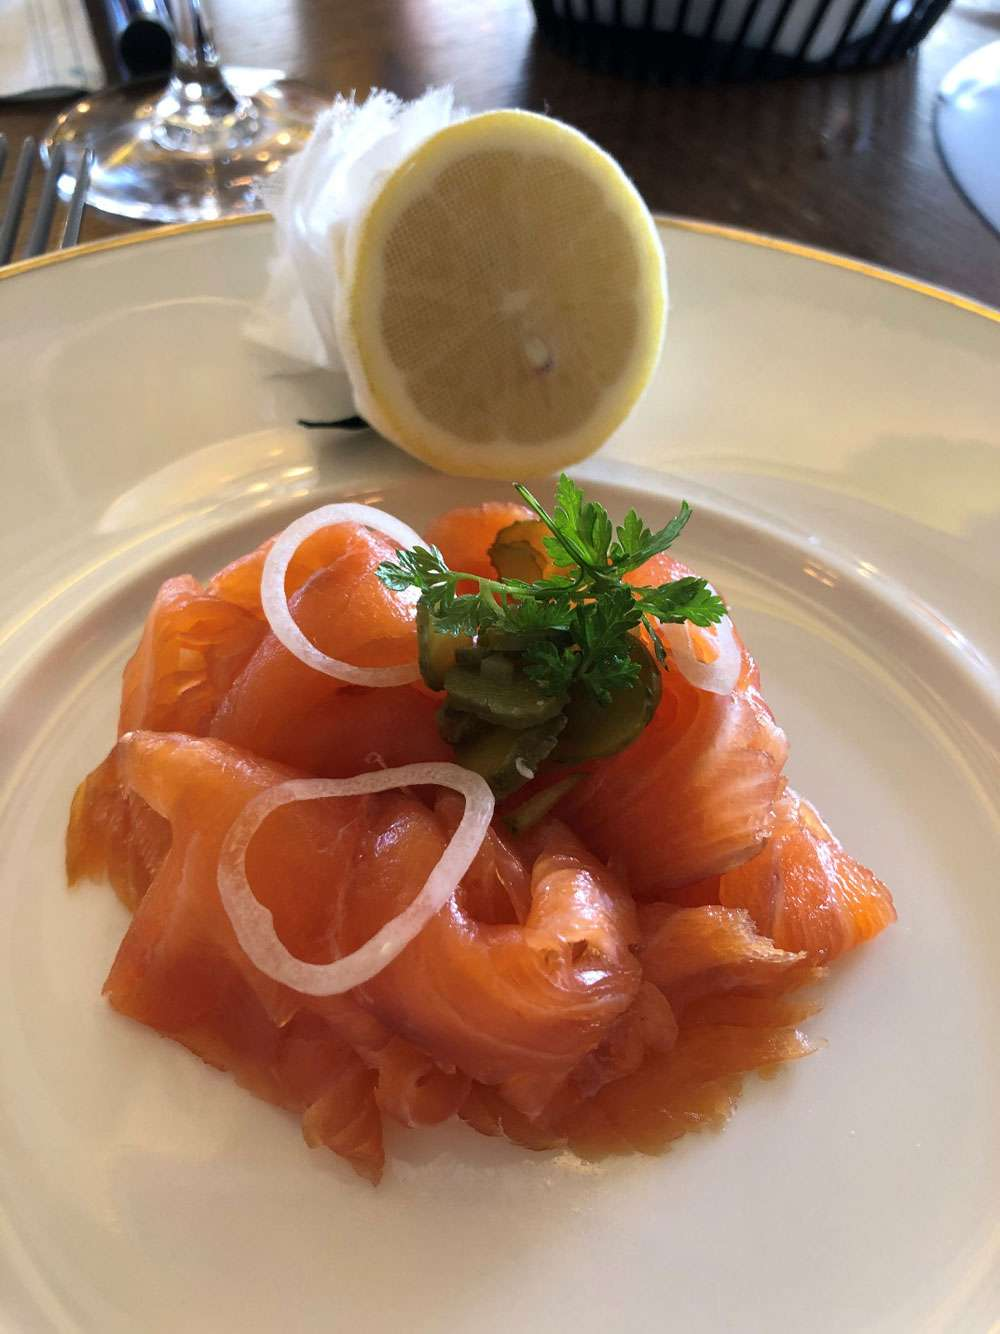 The Gastronome Restaurant Reviews - Brasserie Prince, The Balmoral, 1 Princes St, Edinburgh EH2 2EQ